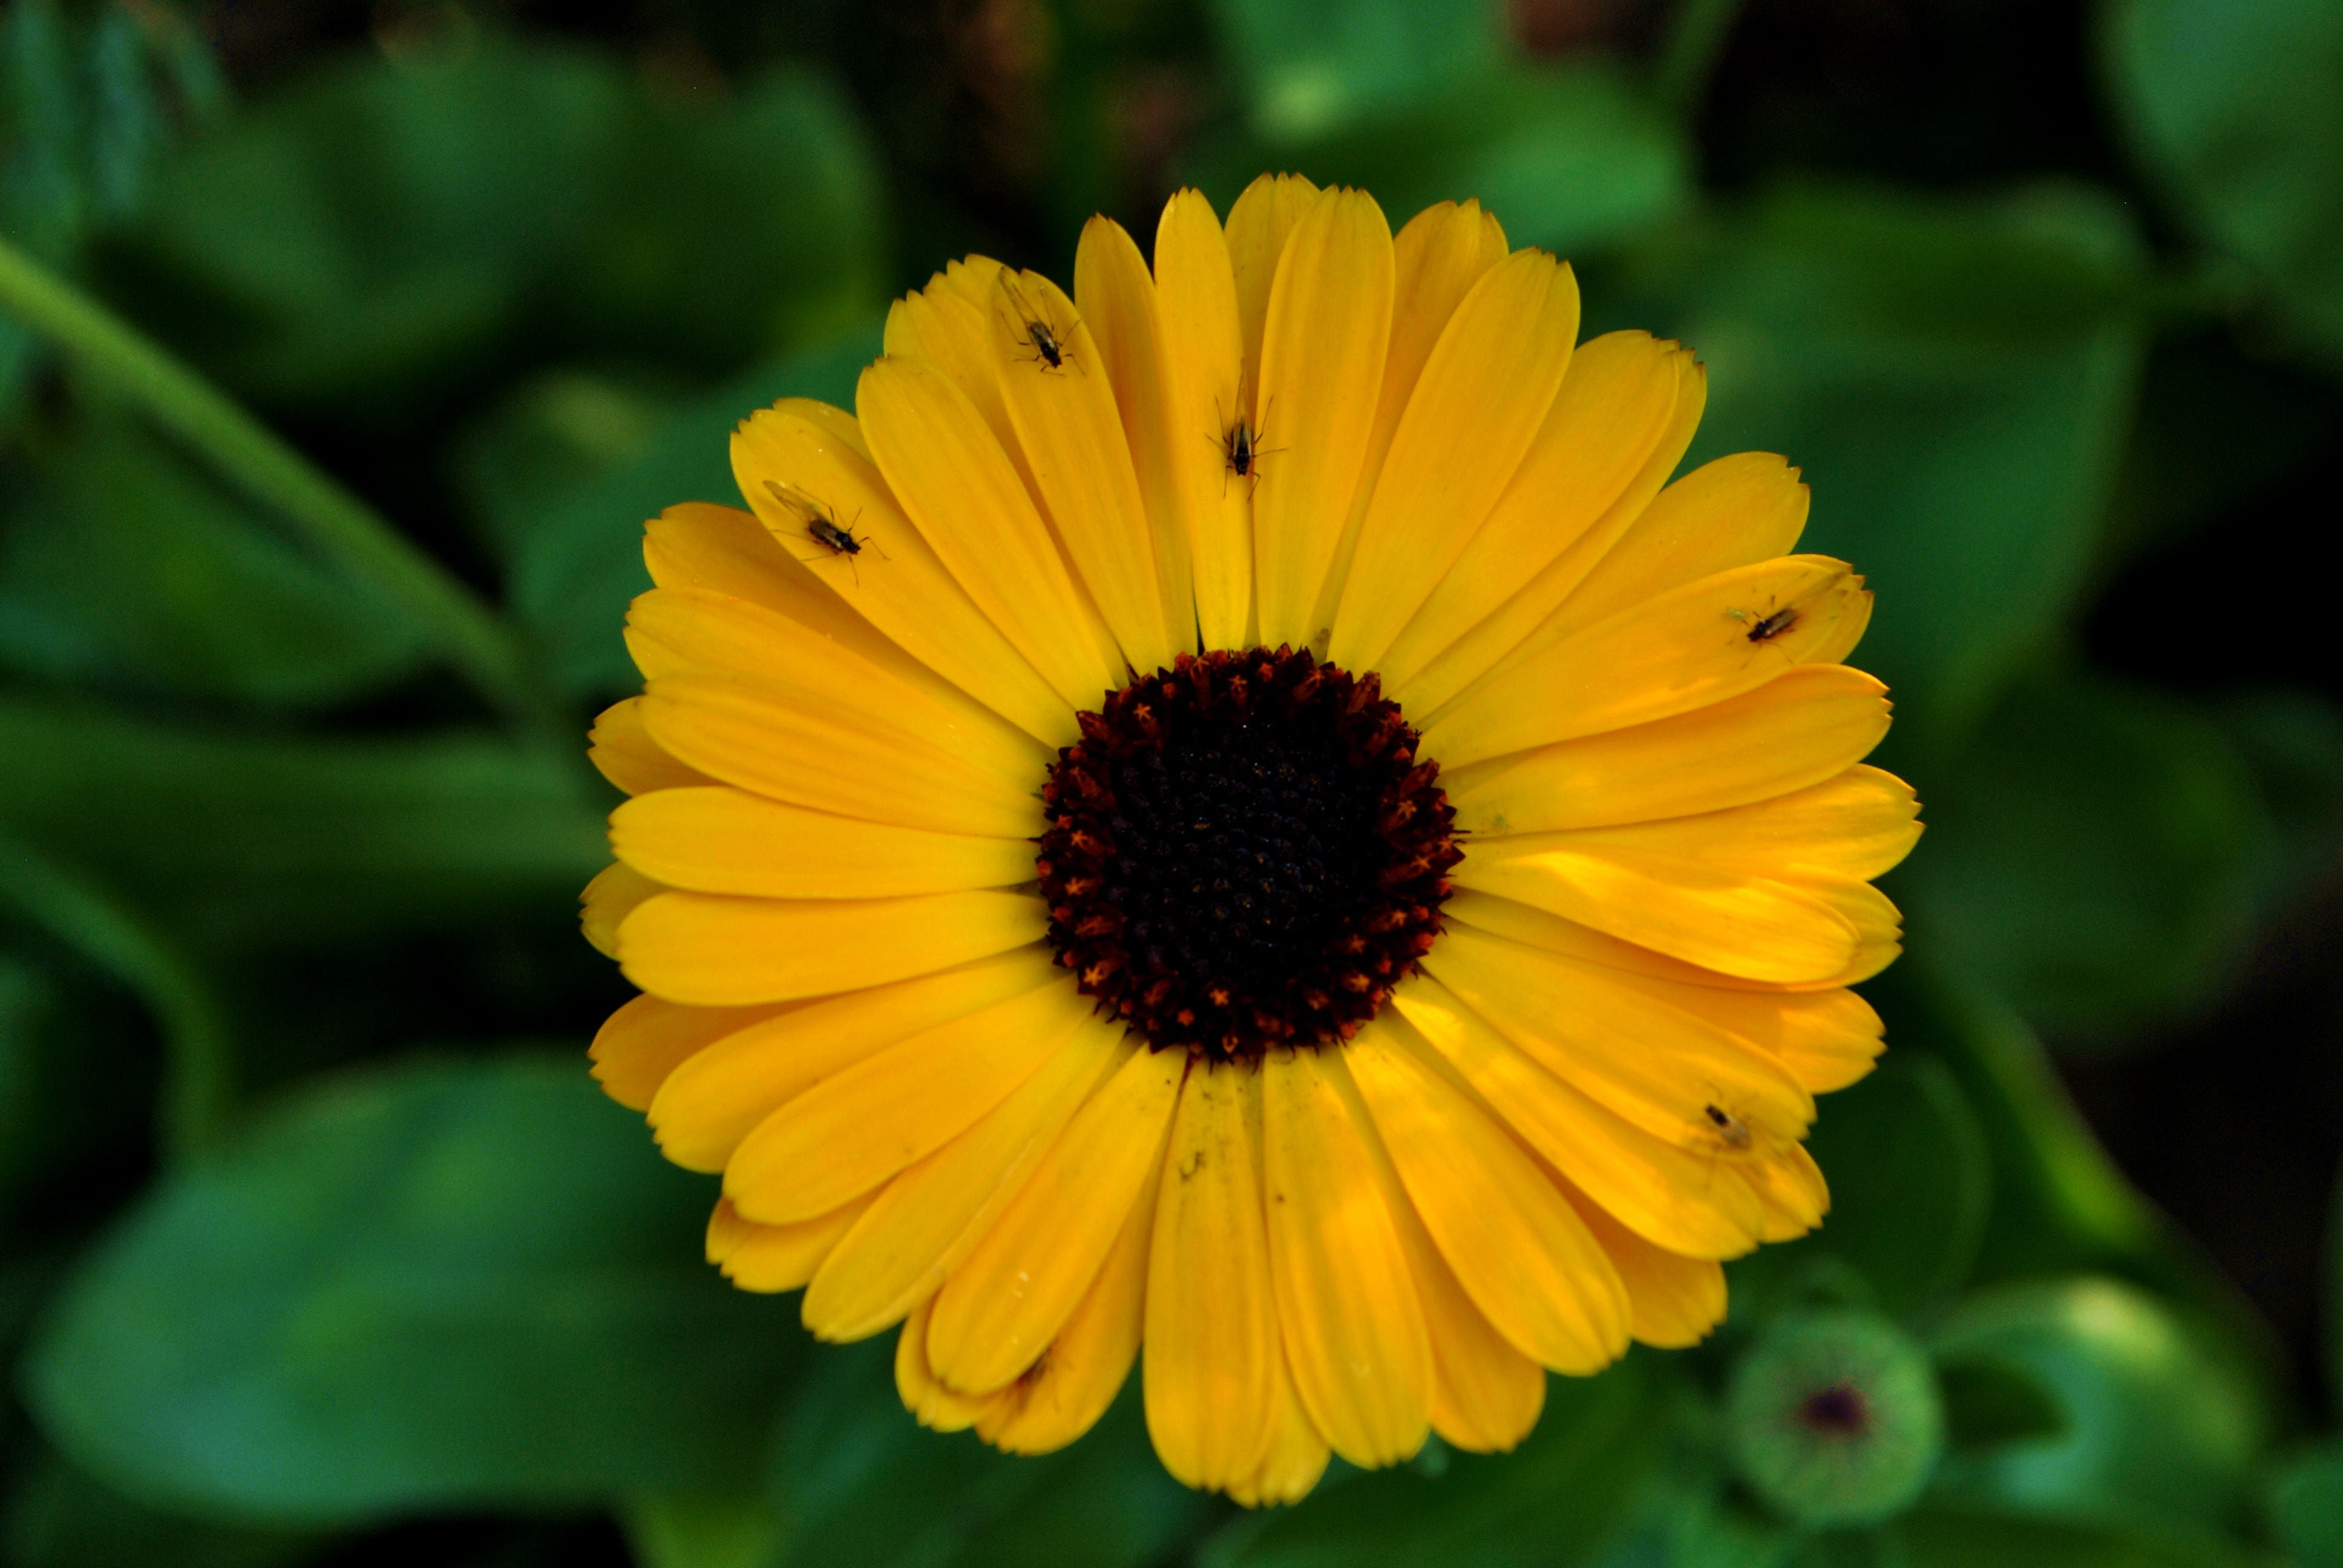 Free stock photo of flowers, garden, yellow flowers